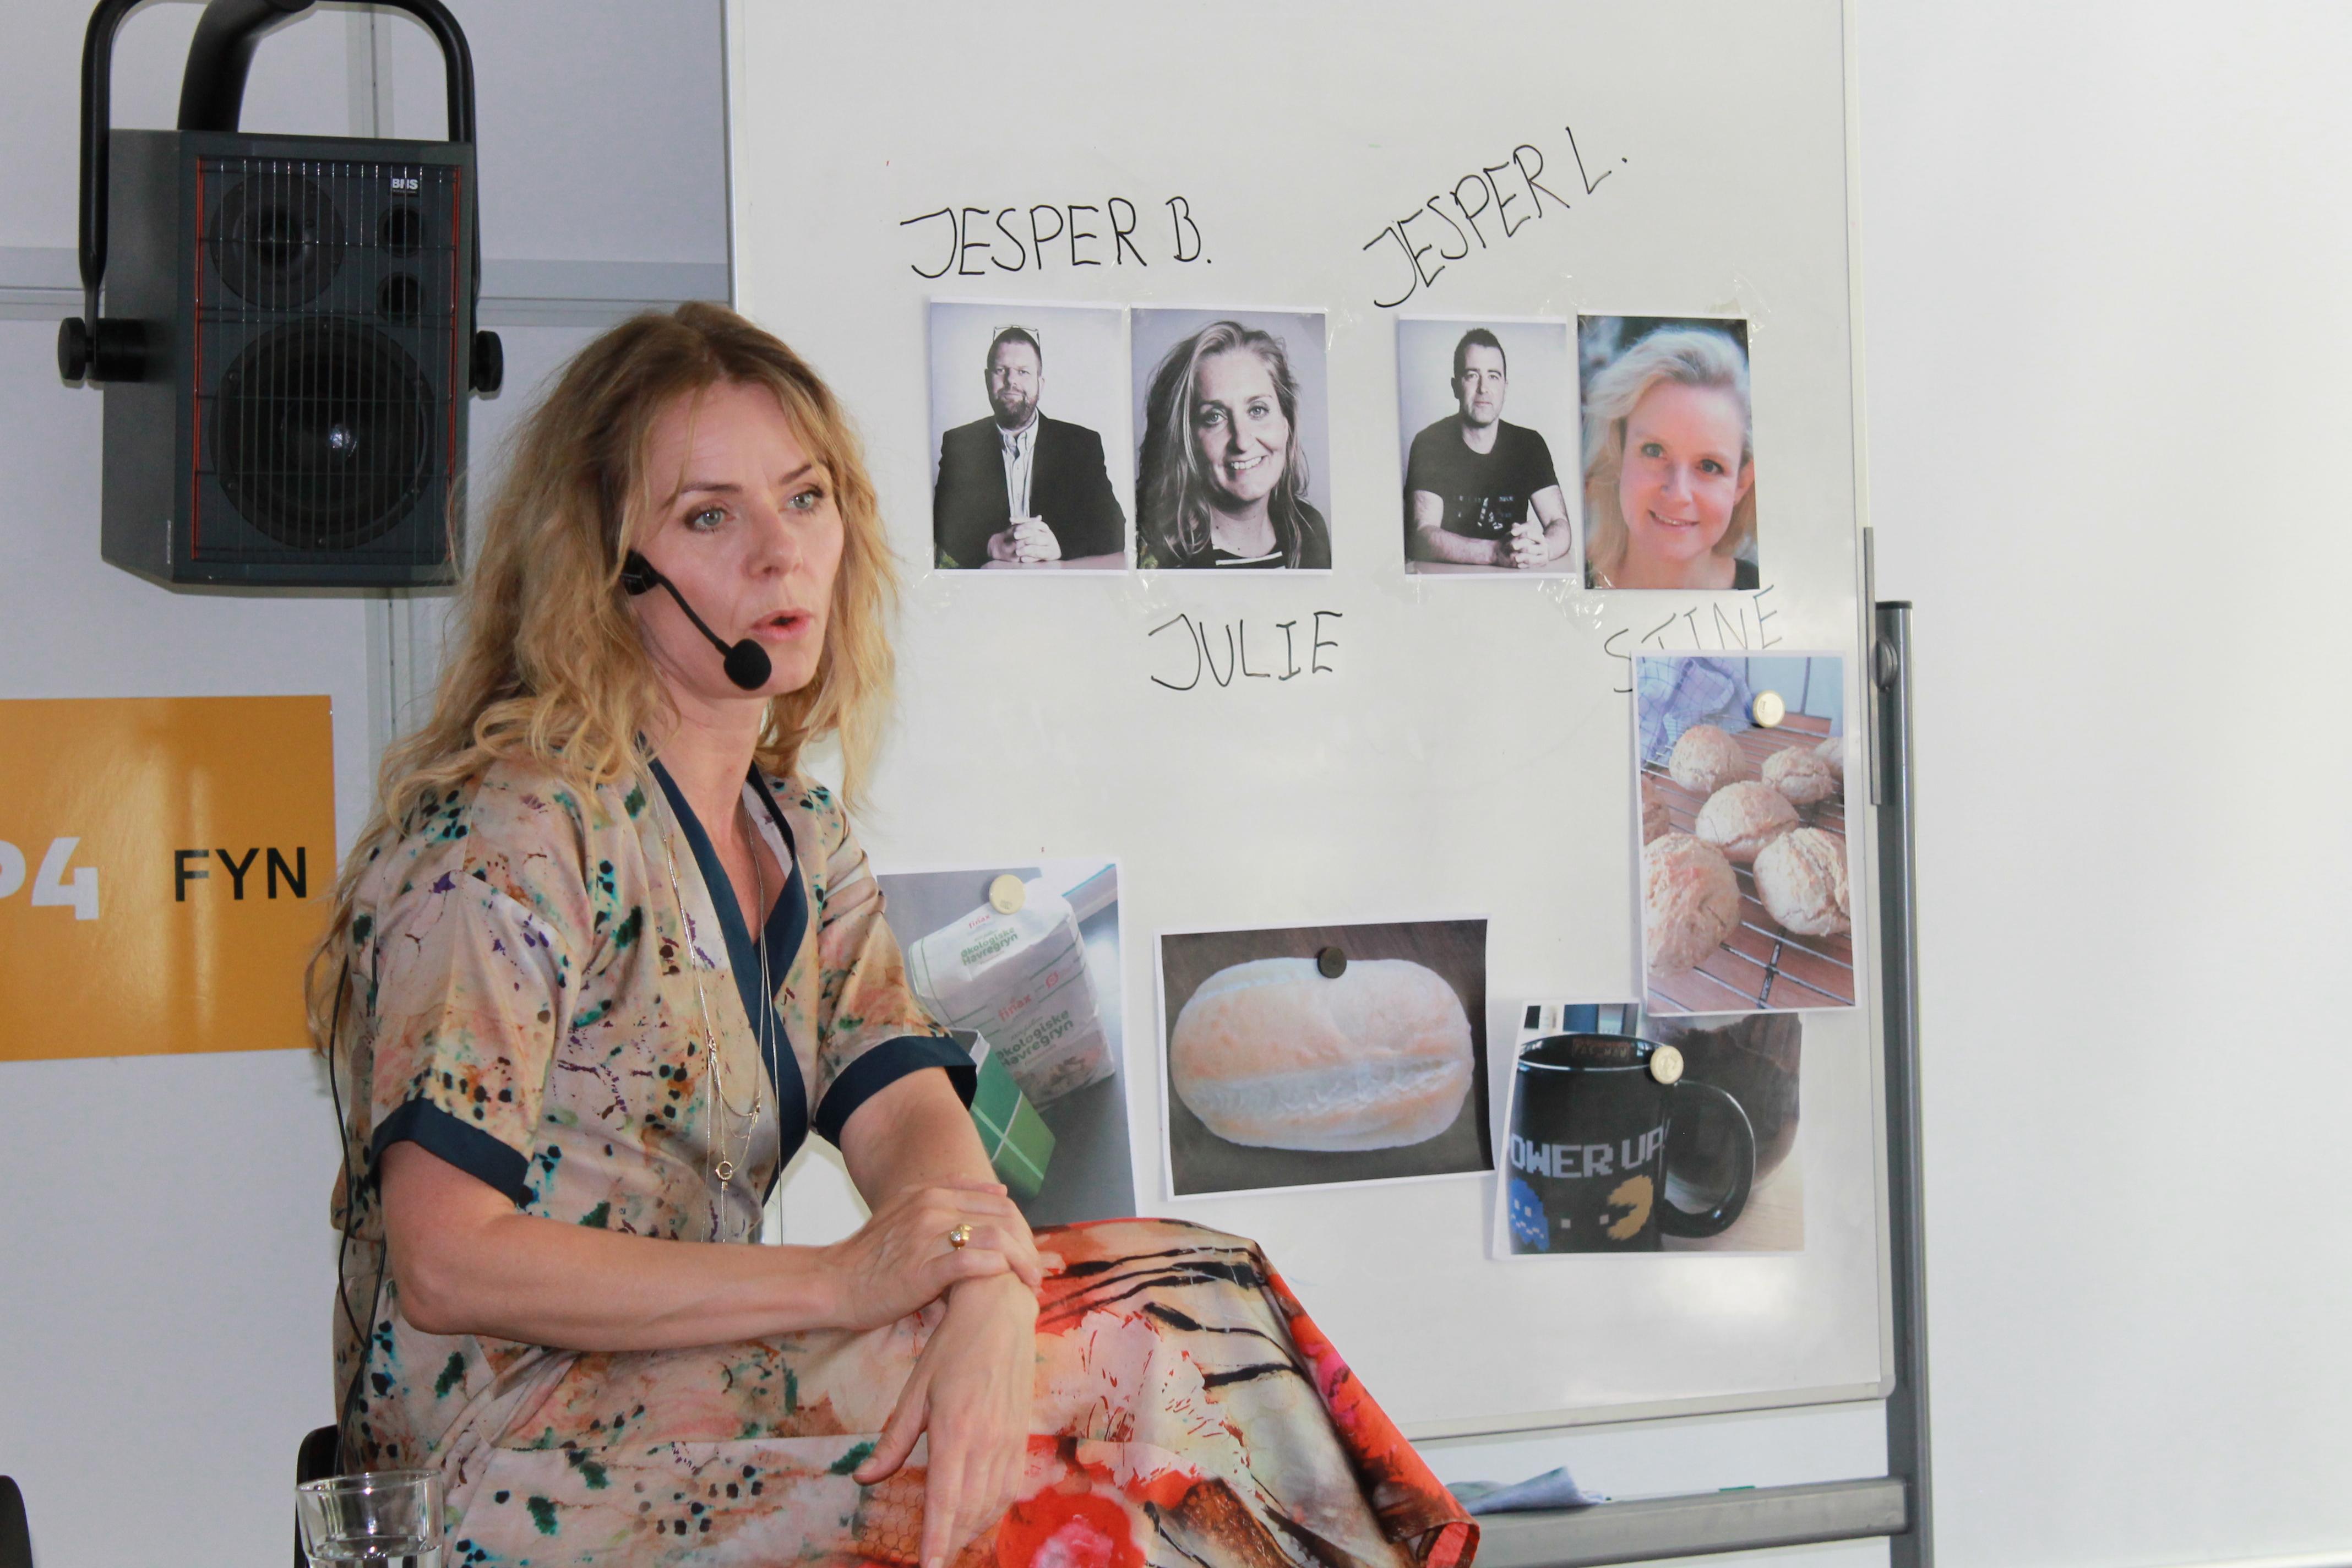 gradis porno film erotisk massage nordjylland